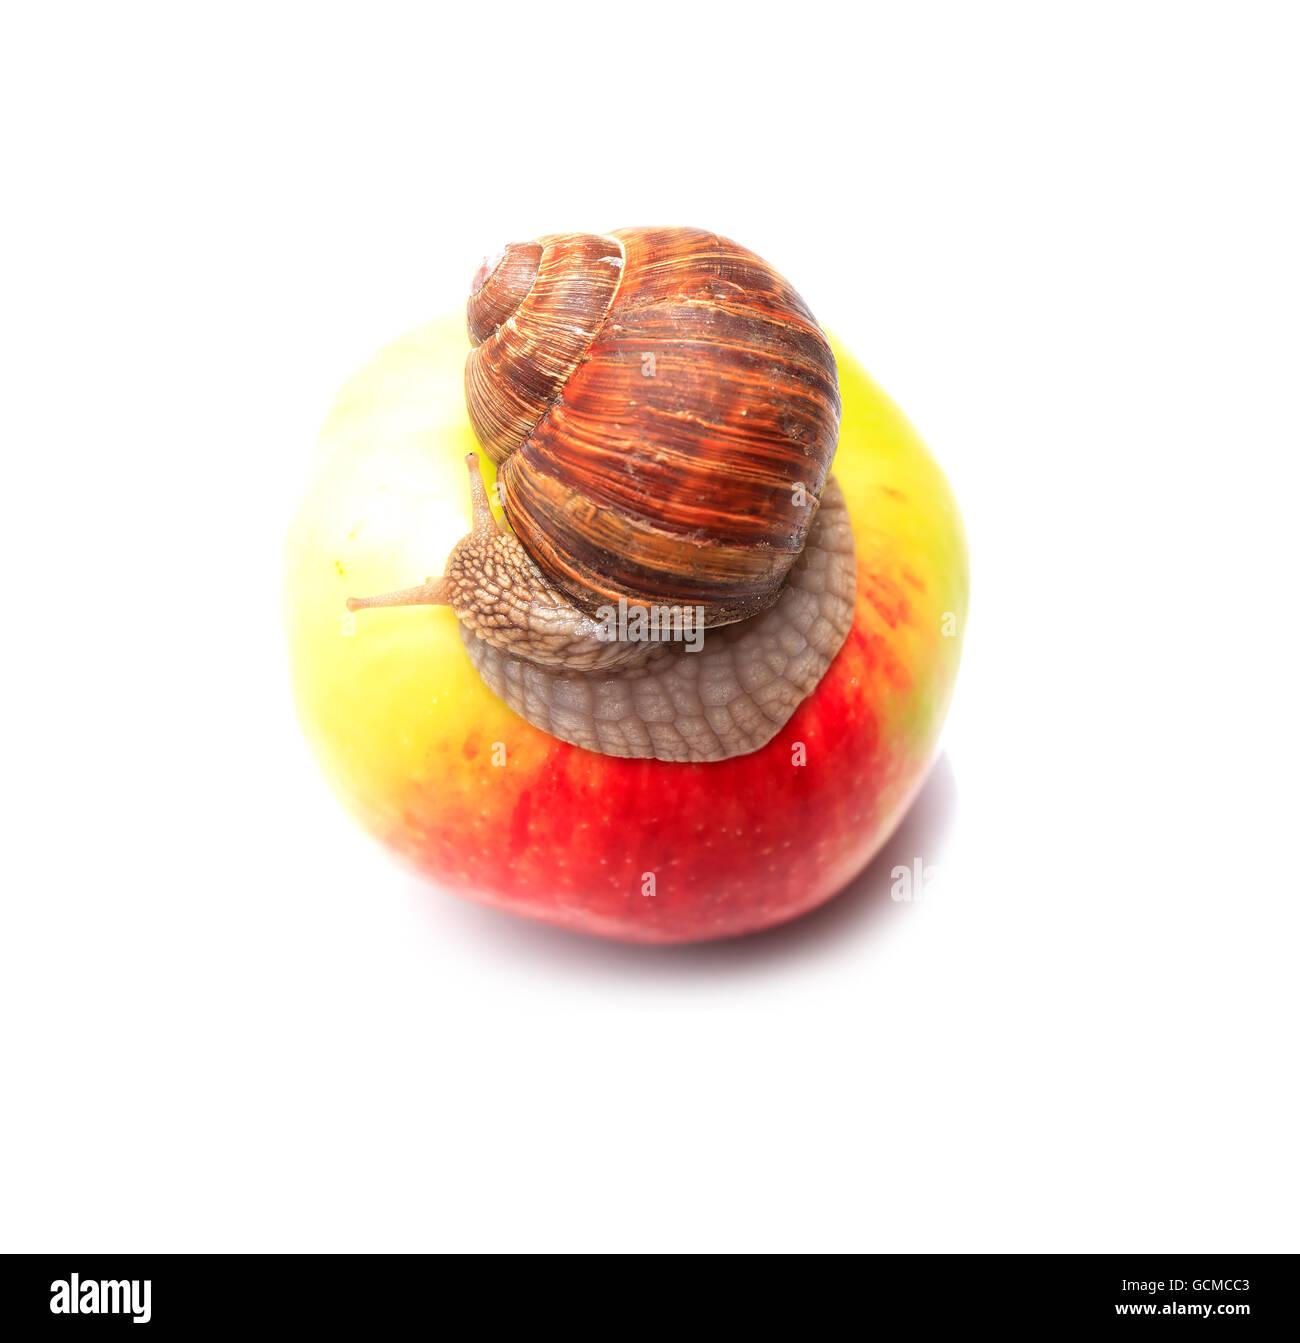 Life concept. Ordinary snail on freshness apple on white background Stock Photo